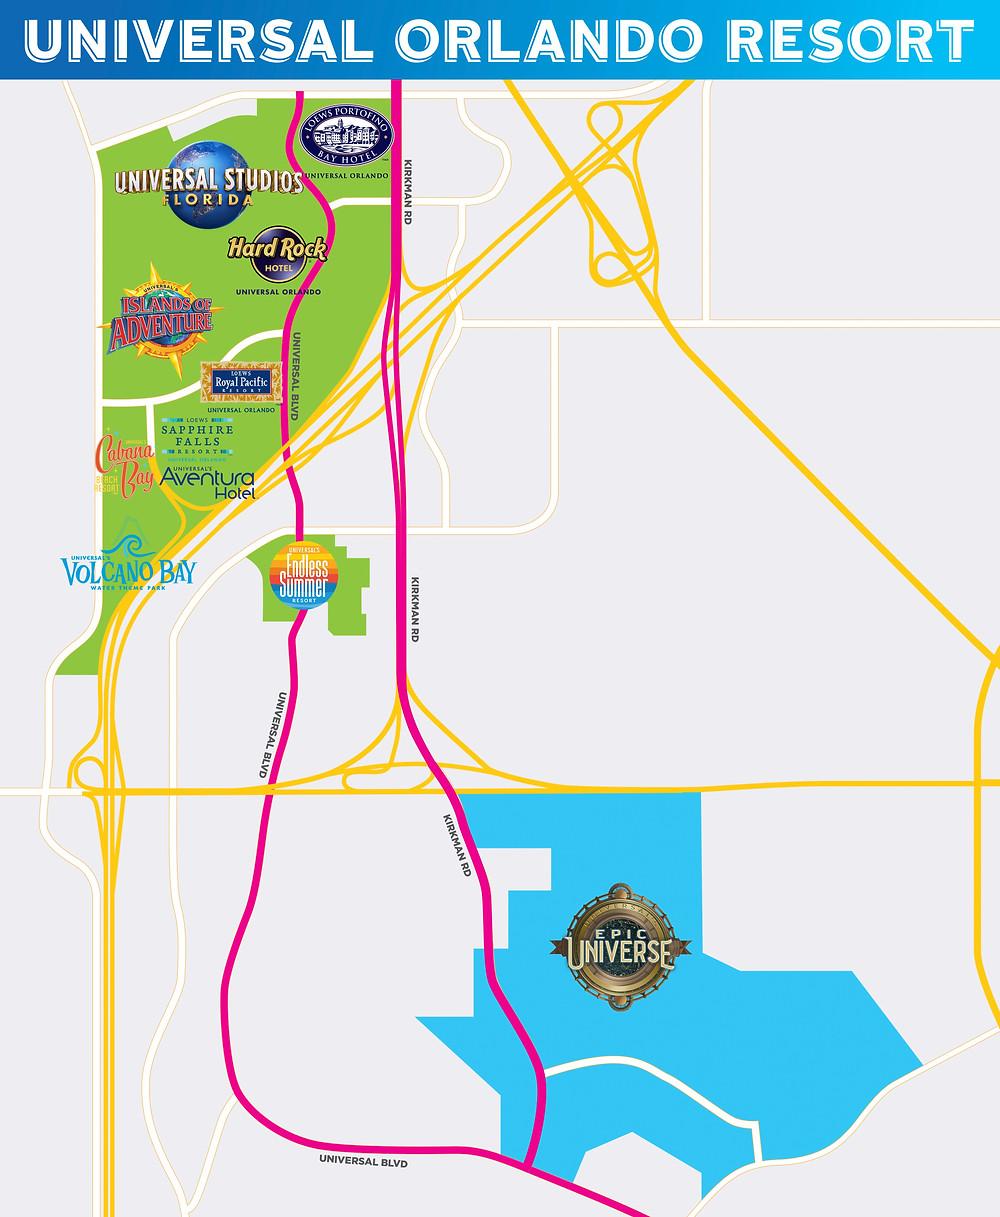 Universal's Epic Universe - New Theme Park Coming to Universal Orlando Resort